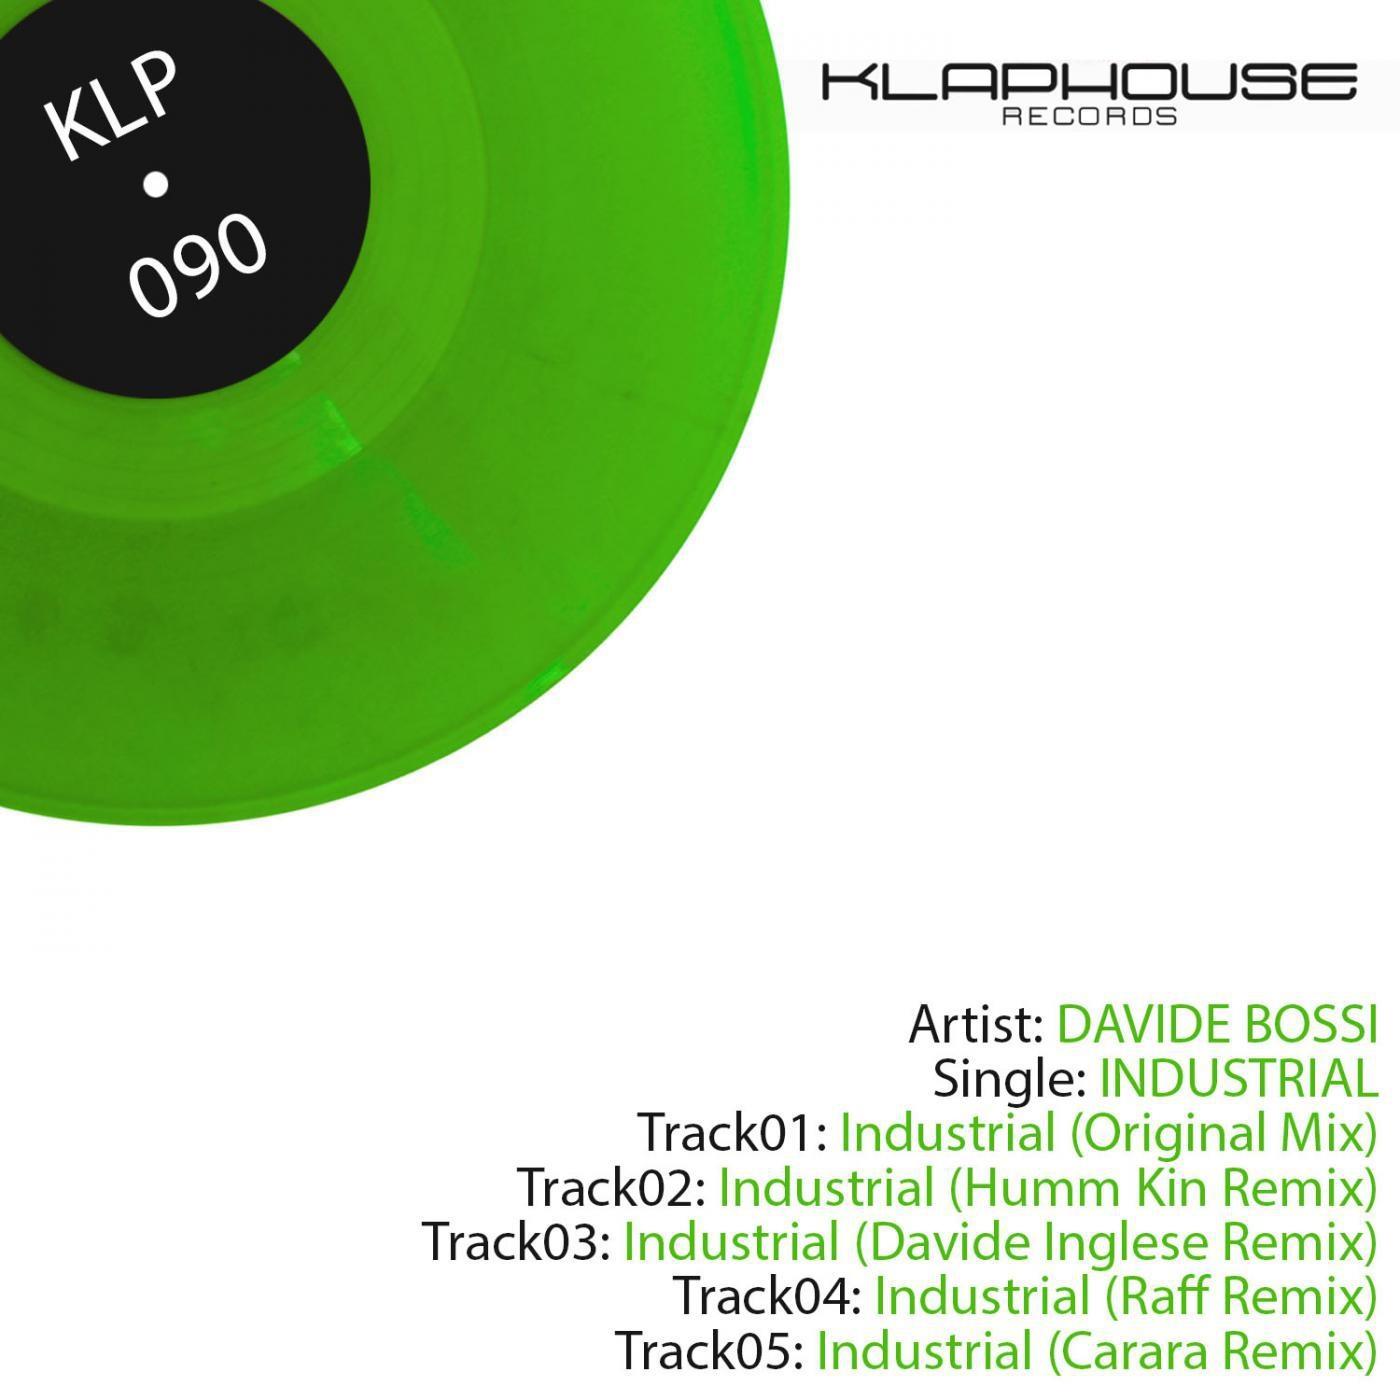 Davide Bossi - Industrial. (Carara remix)